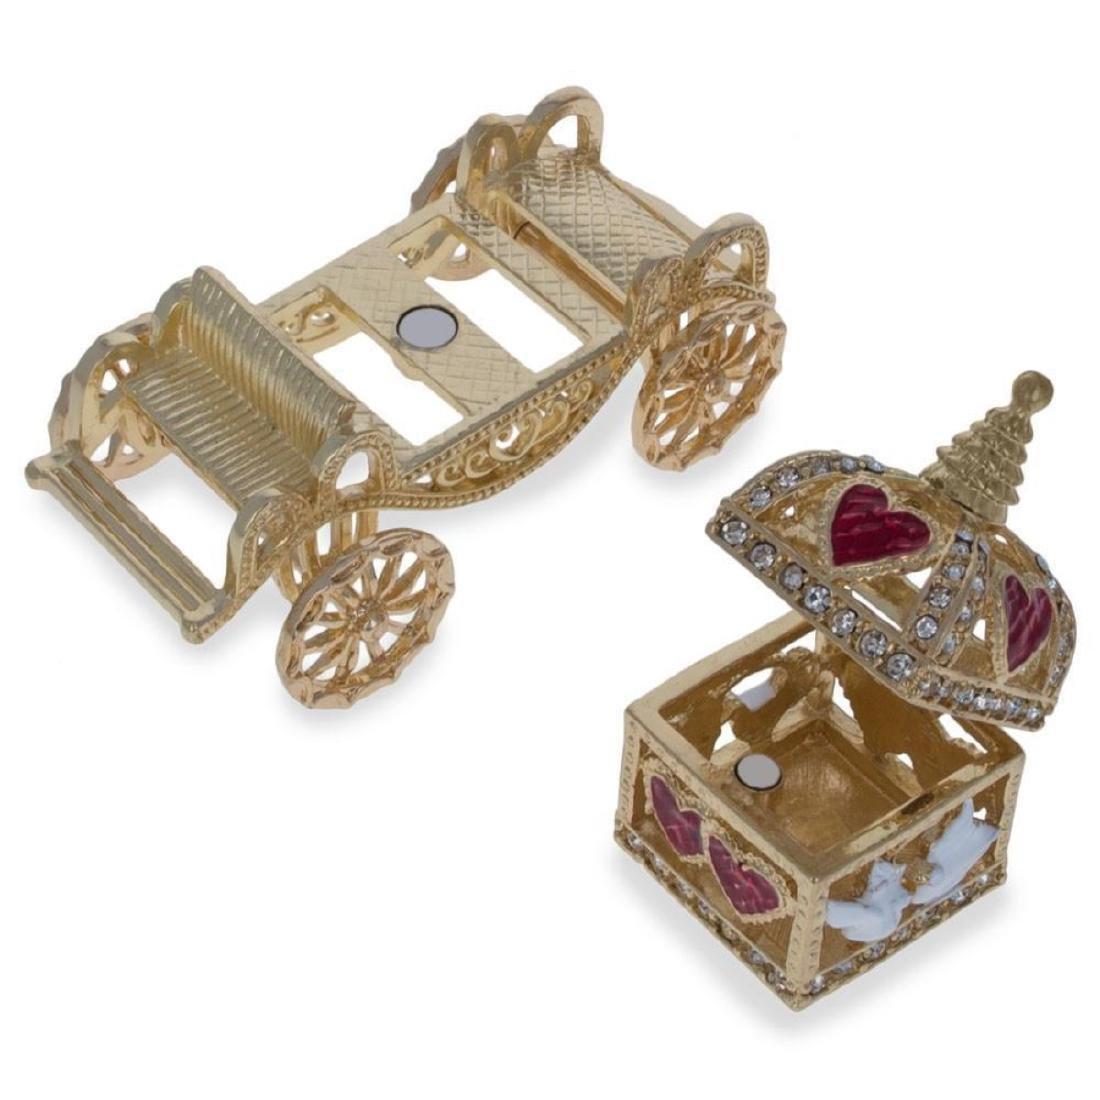 Royal Coronation Coach with Doves Trinket Box Figurine - 4